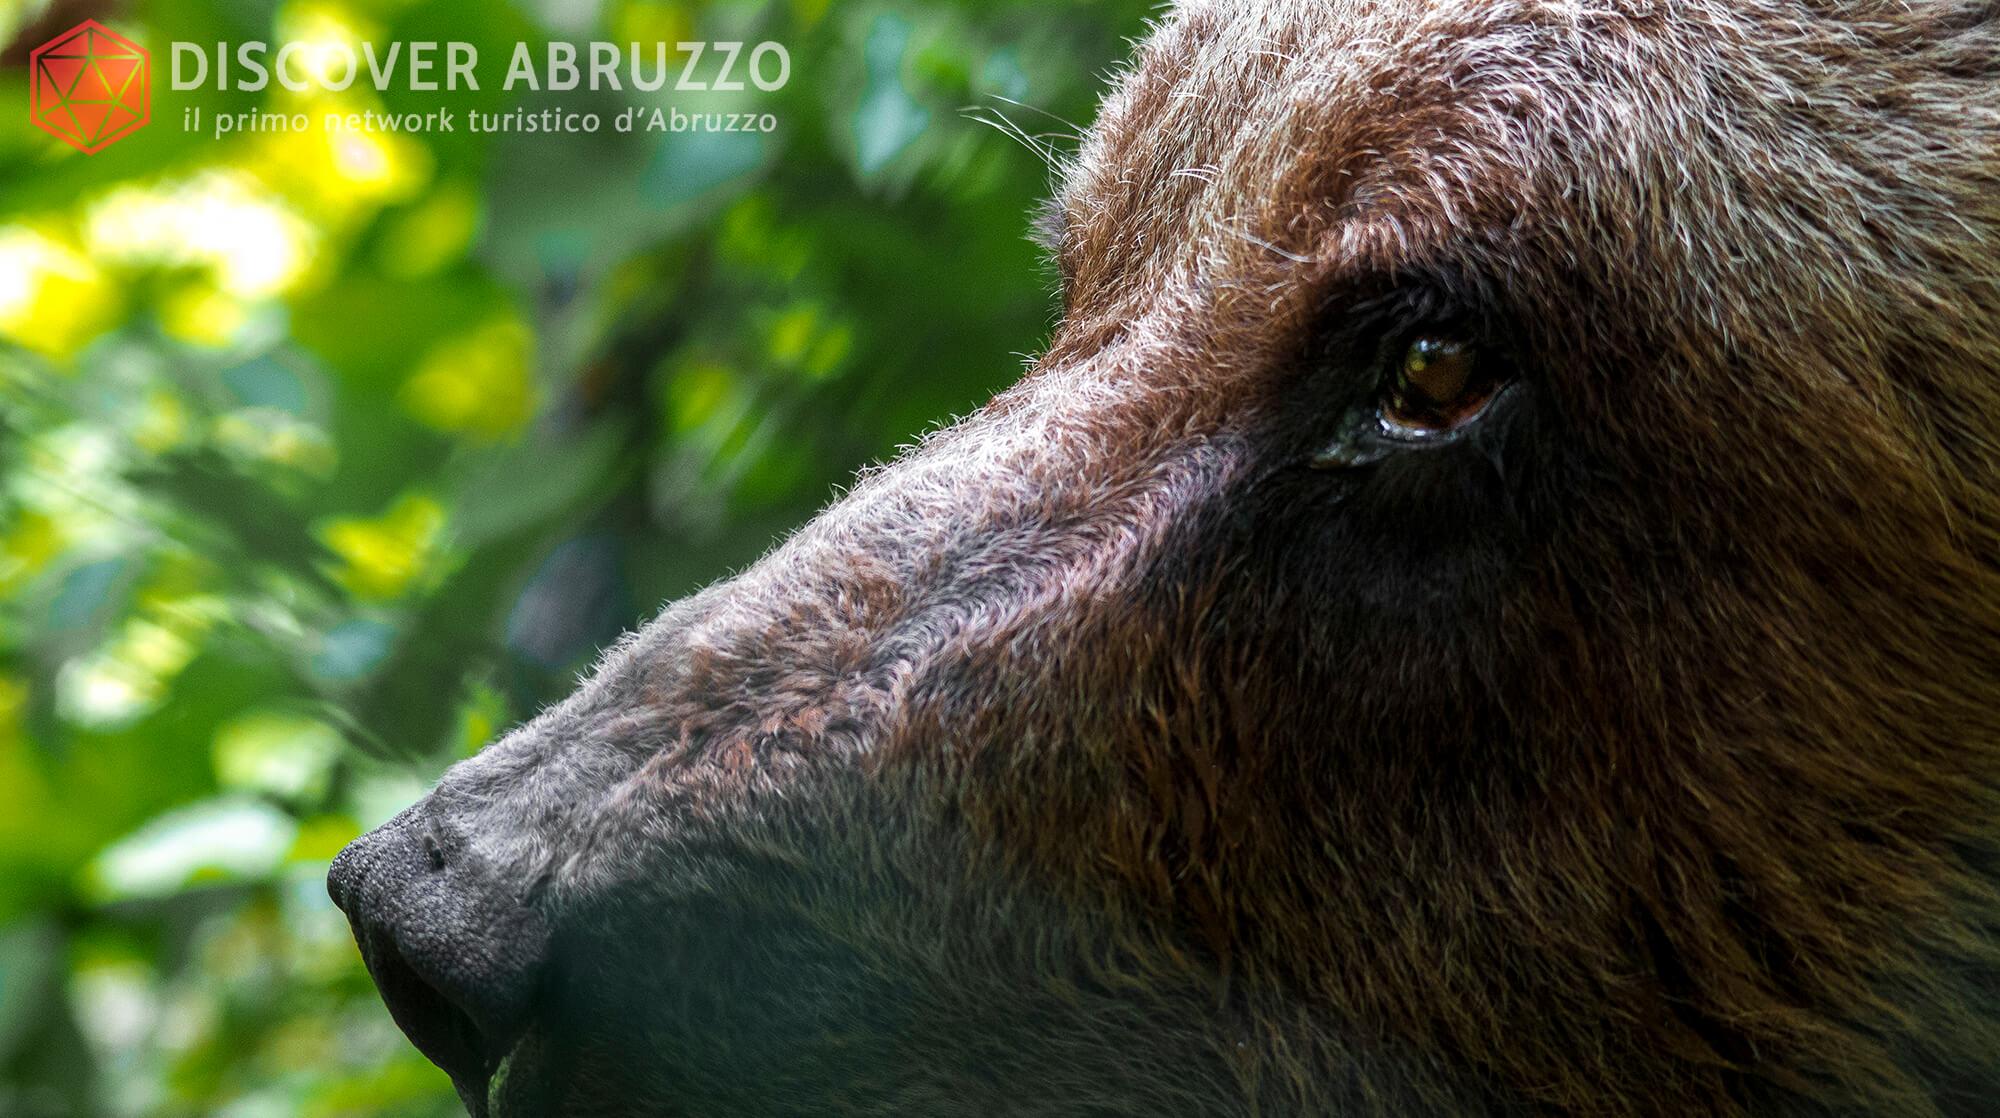 Wildlife Orsomarsicano Discover Abruzzo Nature Ours 5